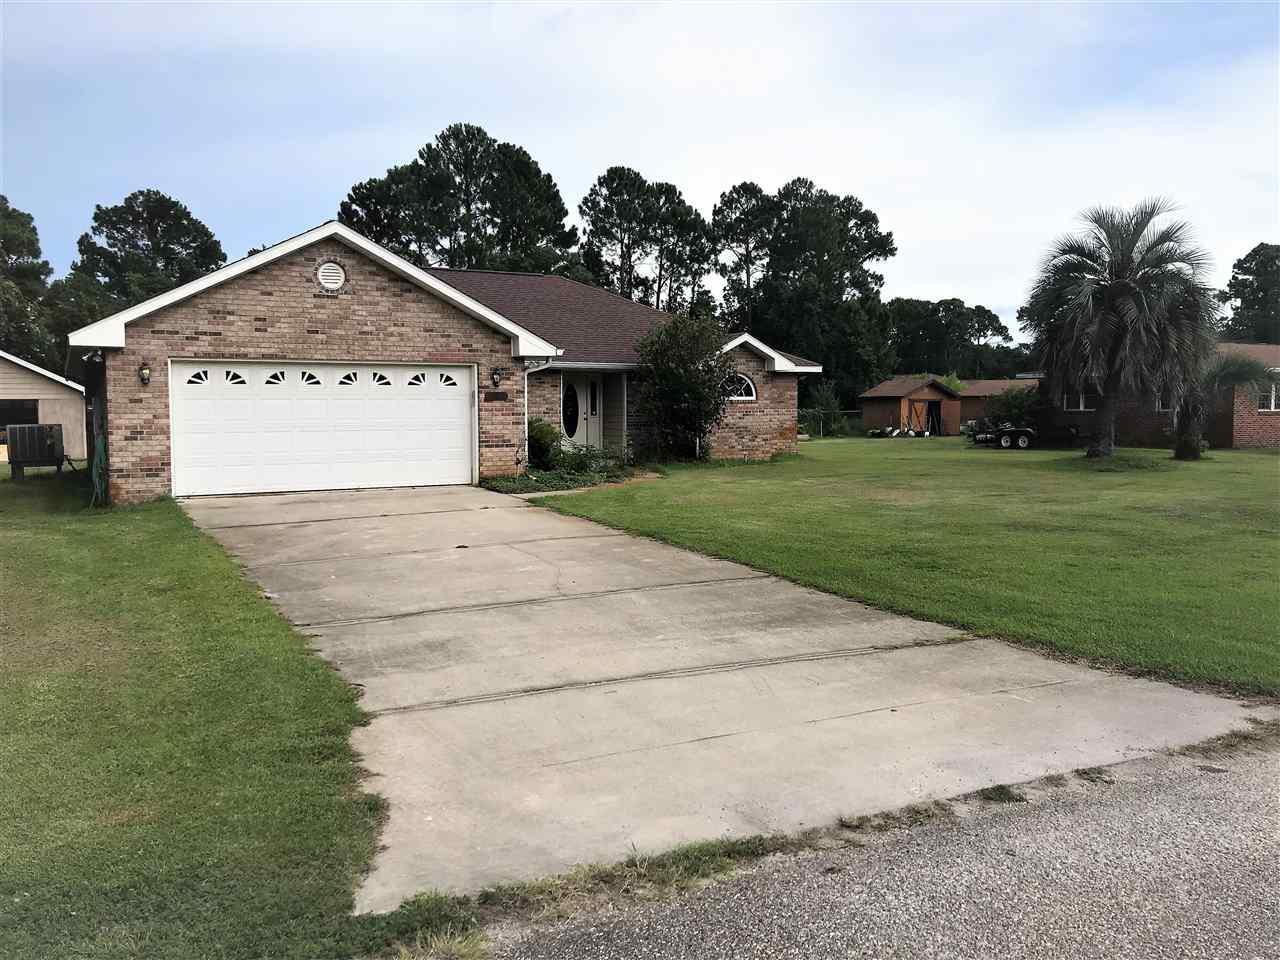 1252 Pine St, Gulf Breeze, FL 32563